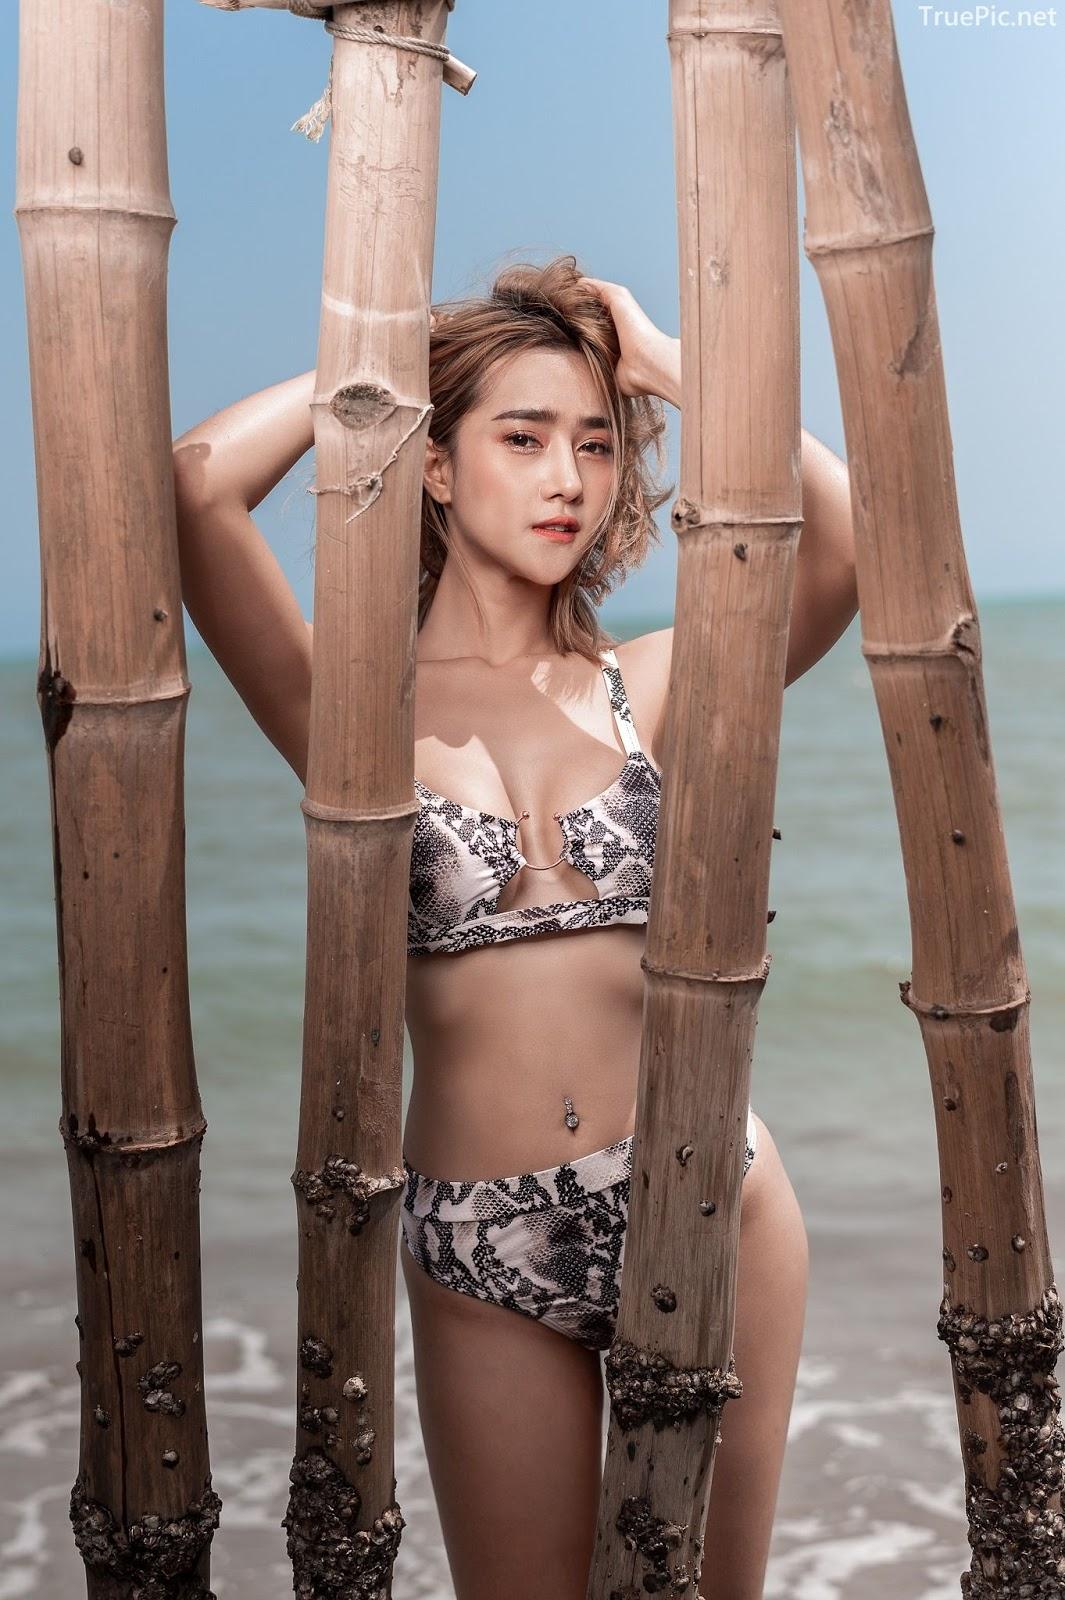 Thailand Hot Model - YingGy Ponjuree - Sea Vibes and Snakeskin Bikini - TruePic.net - Picture 2